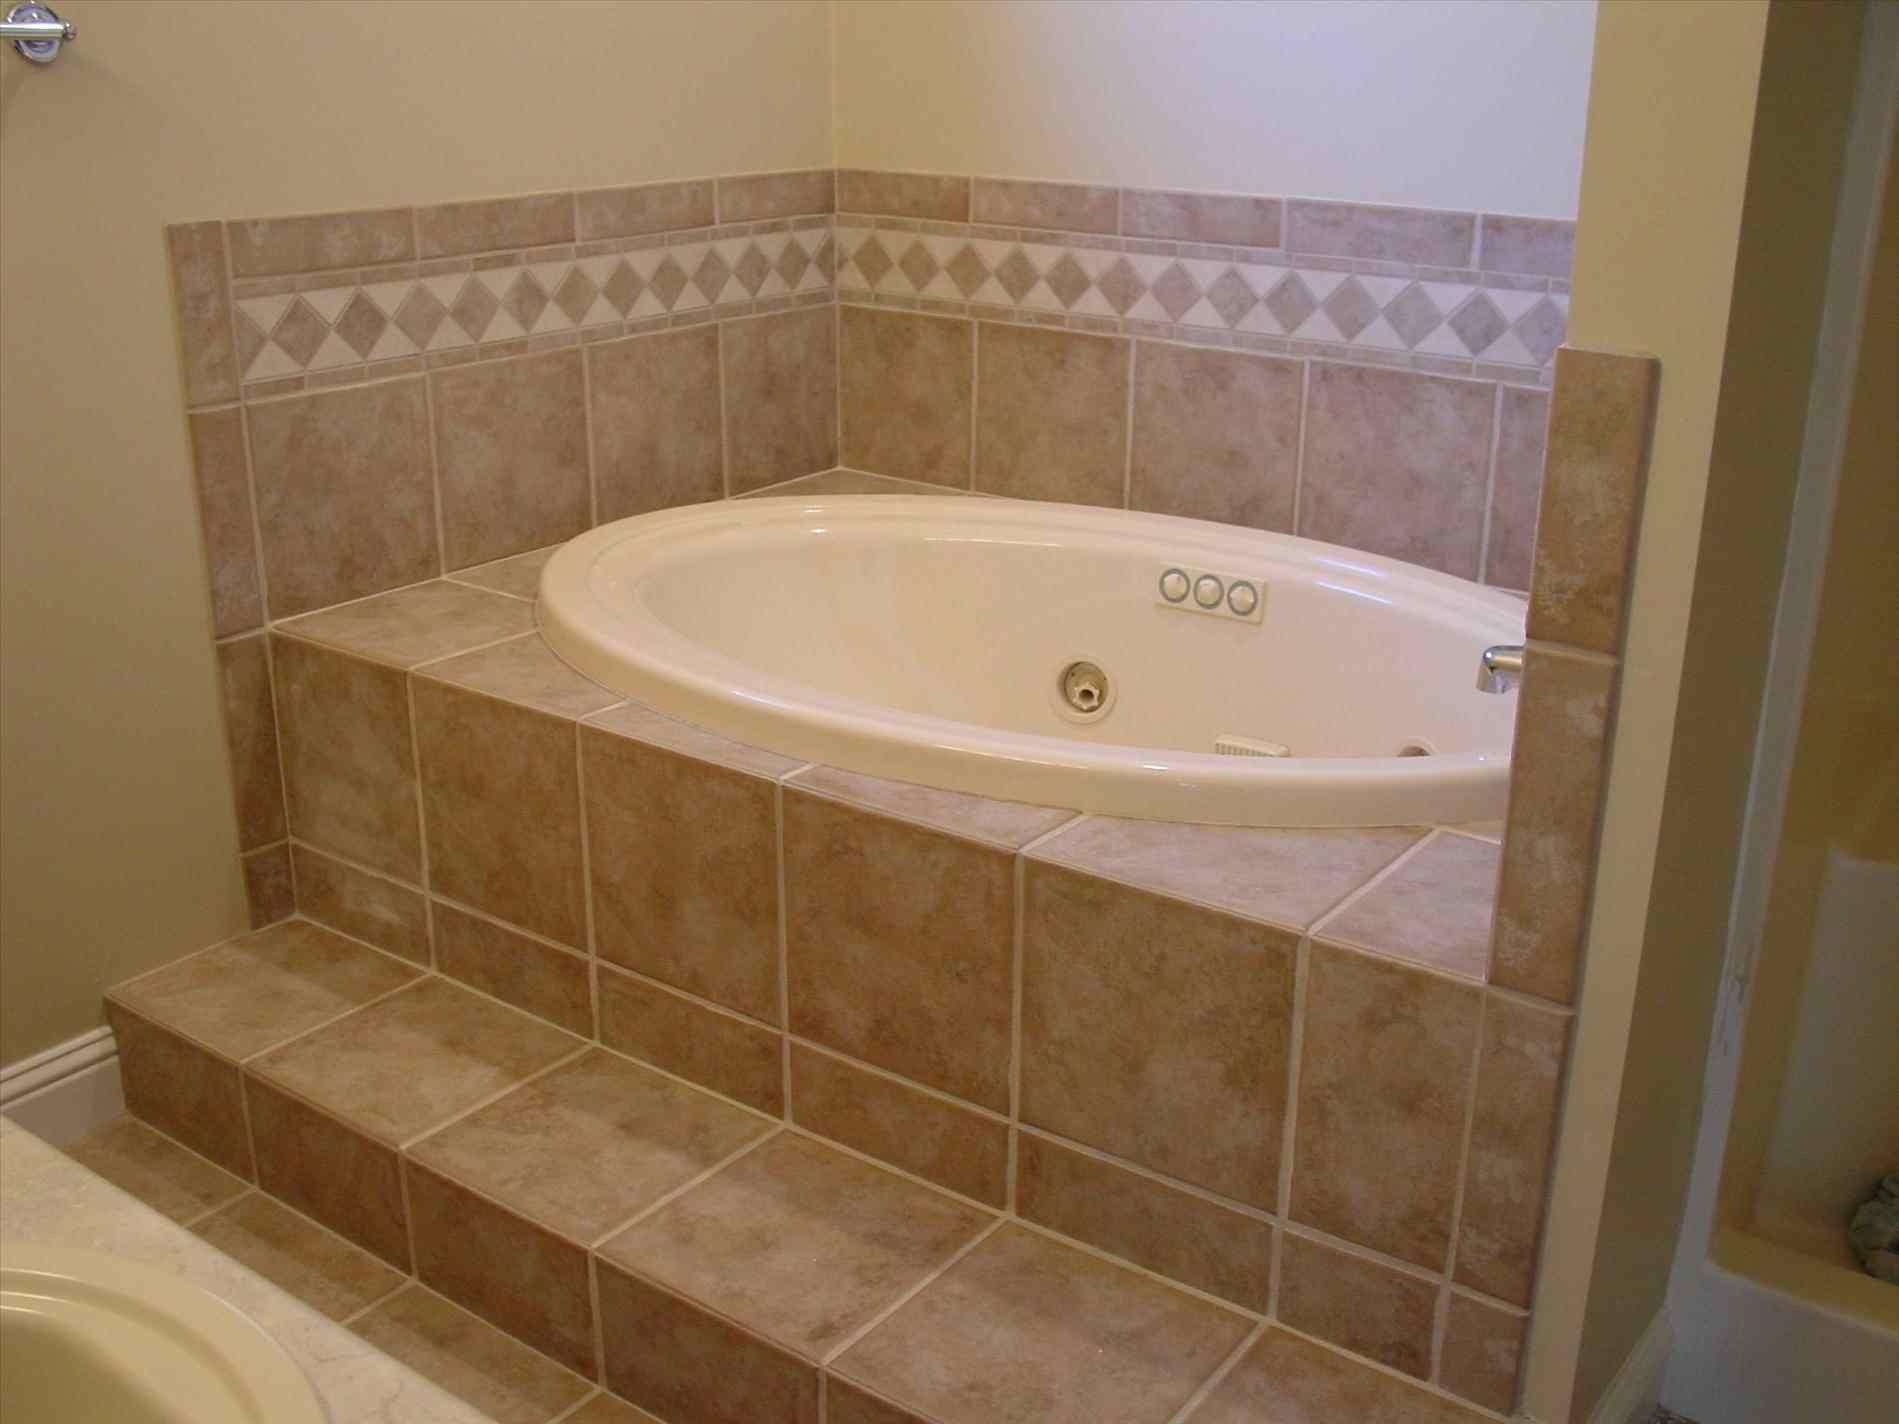 Pin by Slamet Ashari on bathroom tile ideas from lowes | Pinterest ...